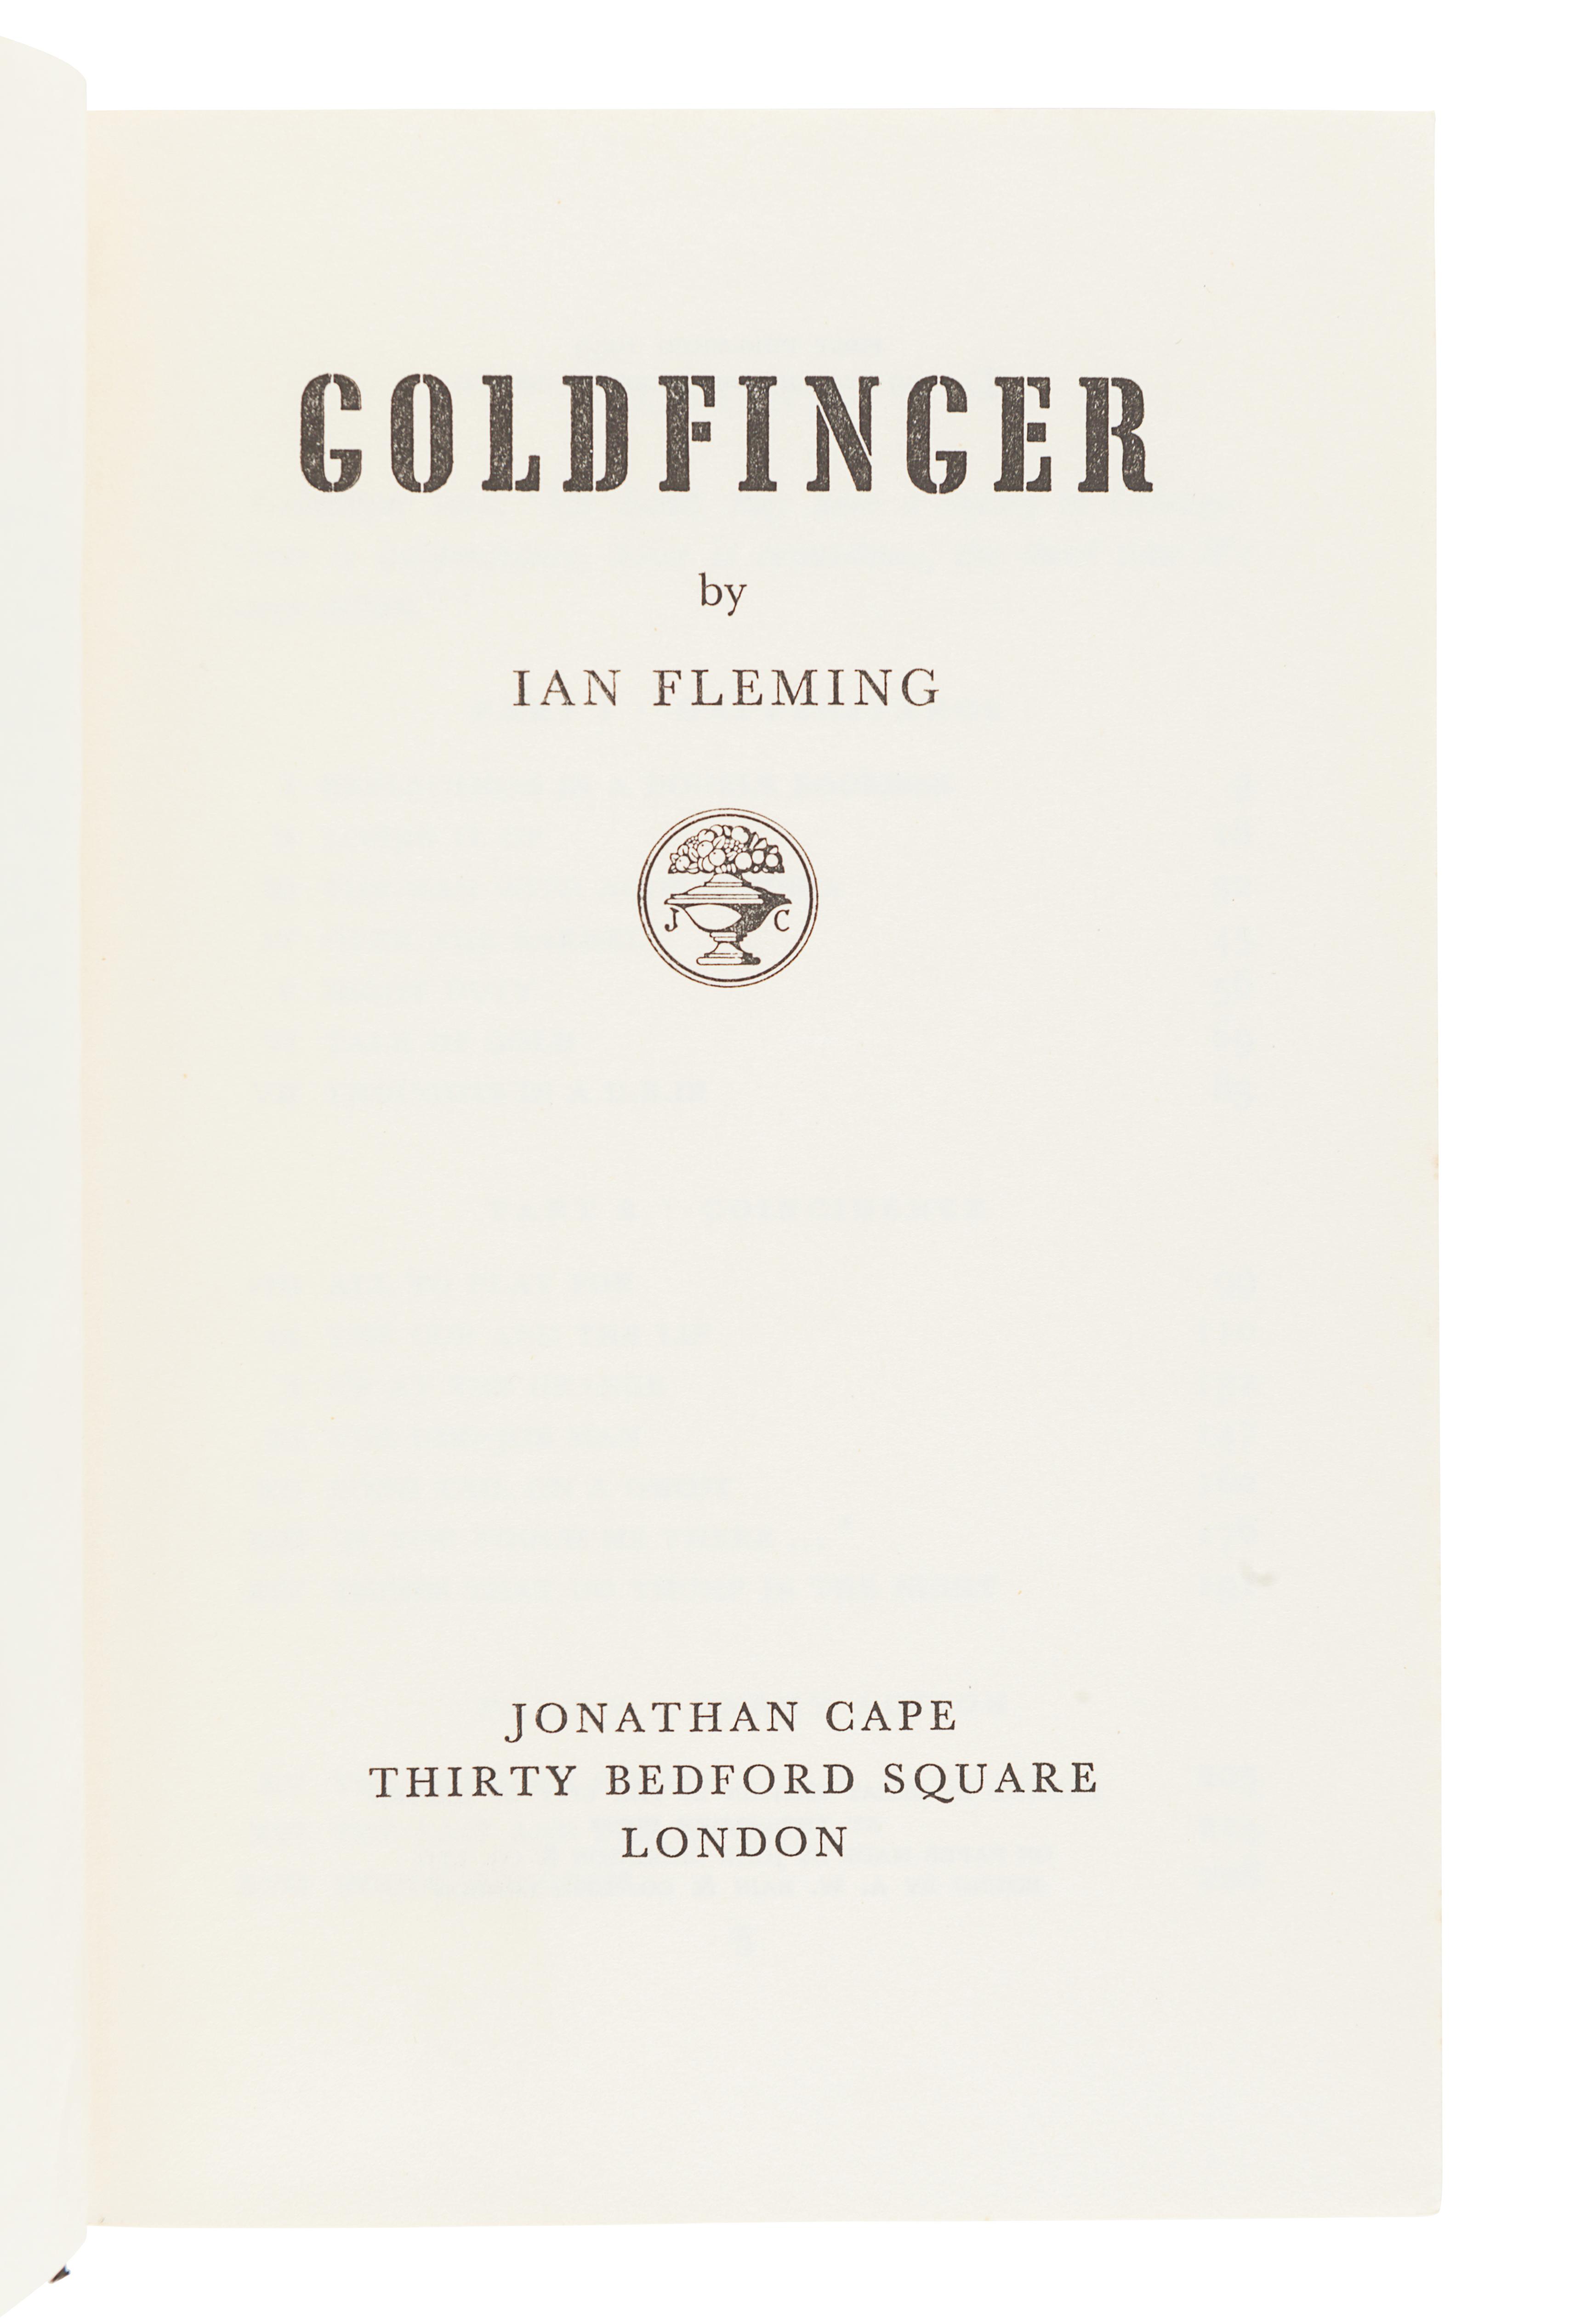 FLEMING, Ian (1908-1964). Goldfinger. London: Jonathan Cape, 1959. - Image 3 of 3